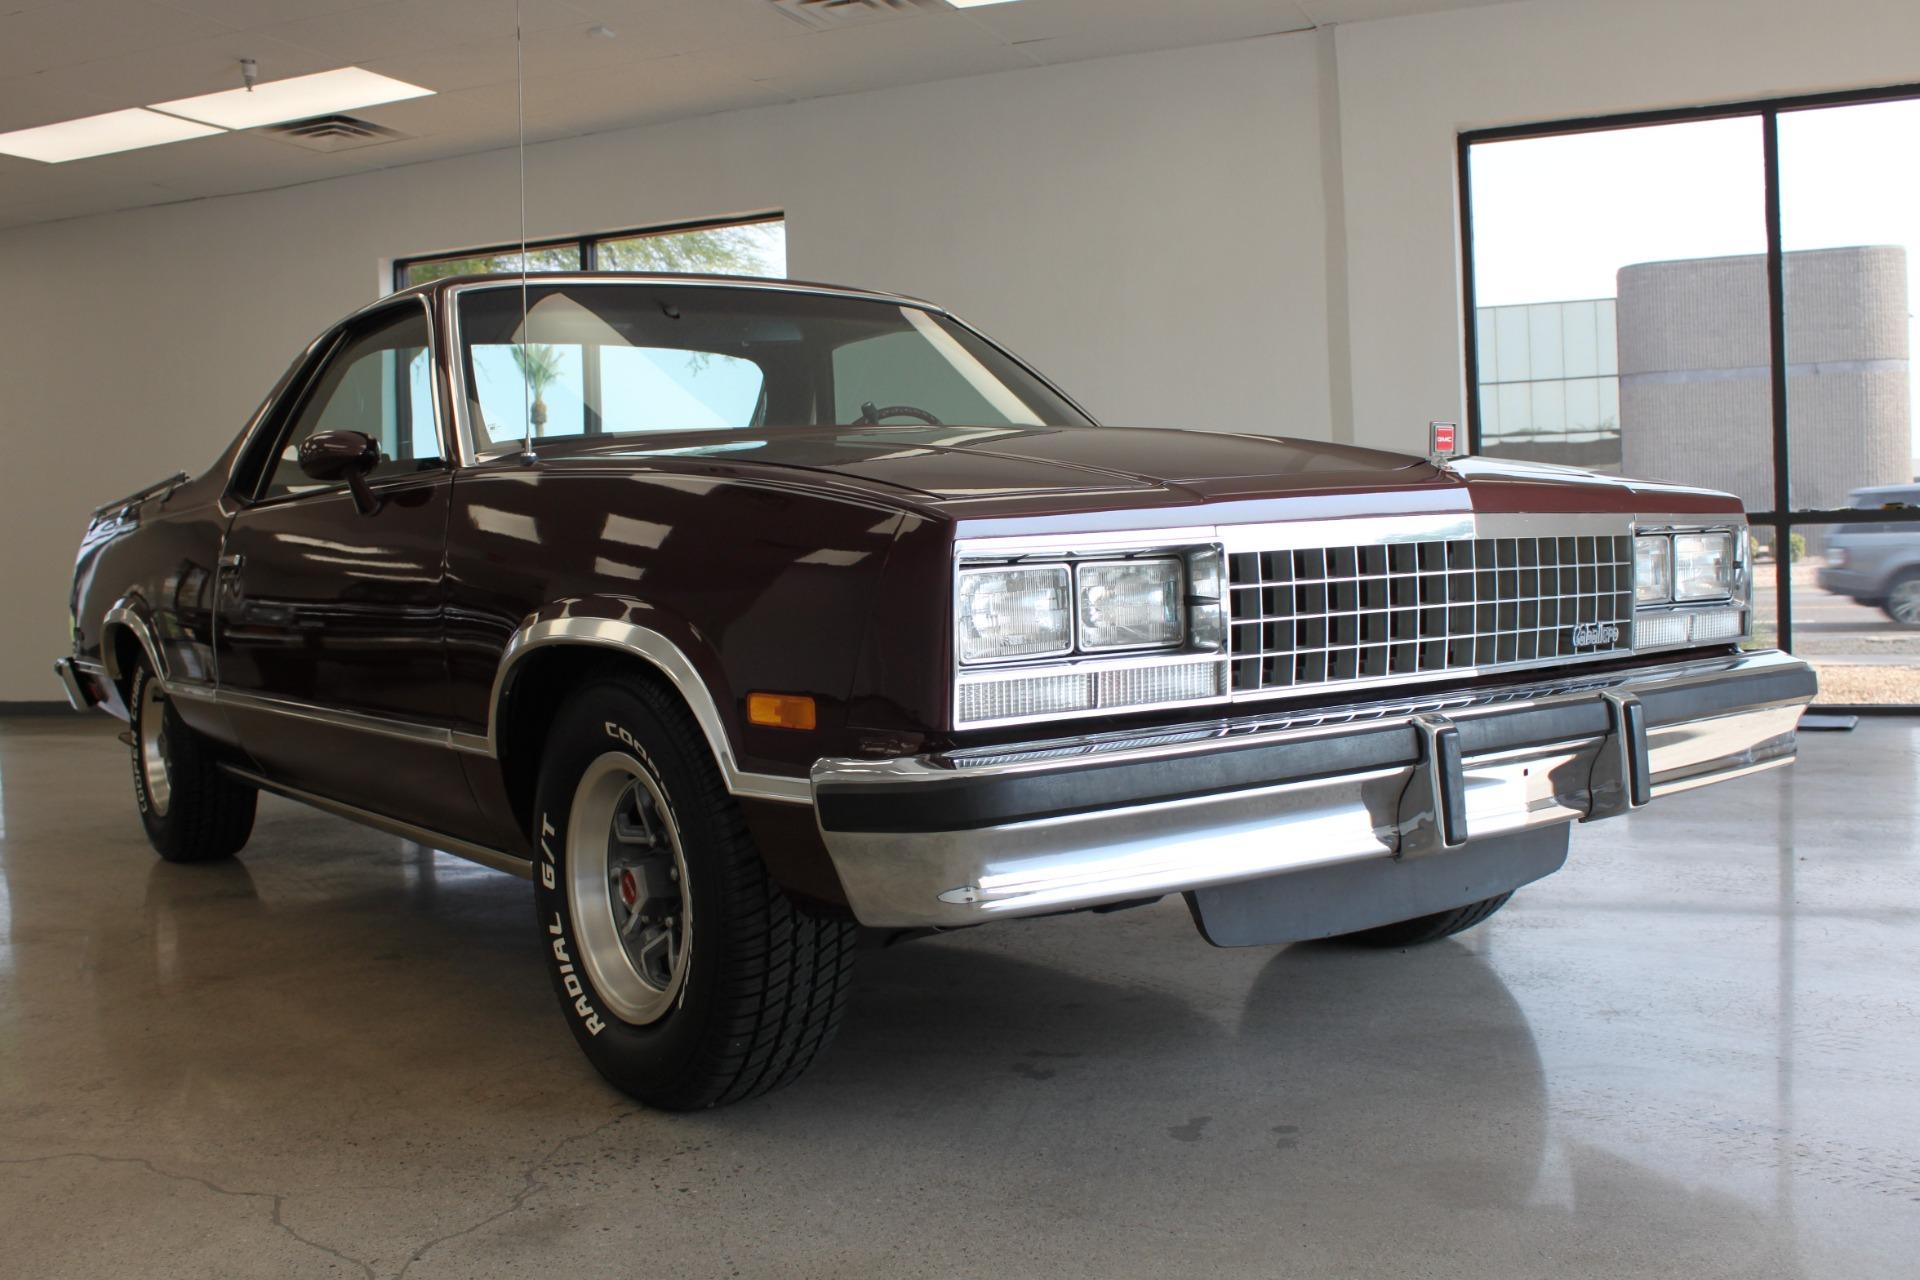 Used-1984-GMC-Caballero-Mercedes-Benz